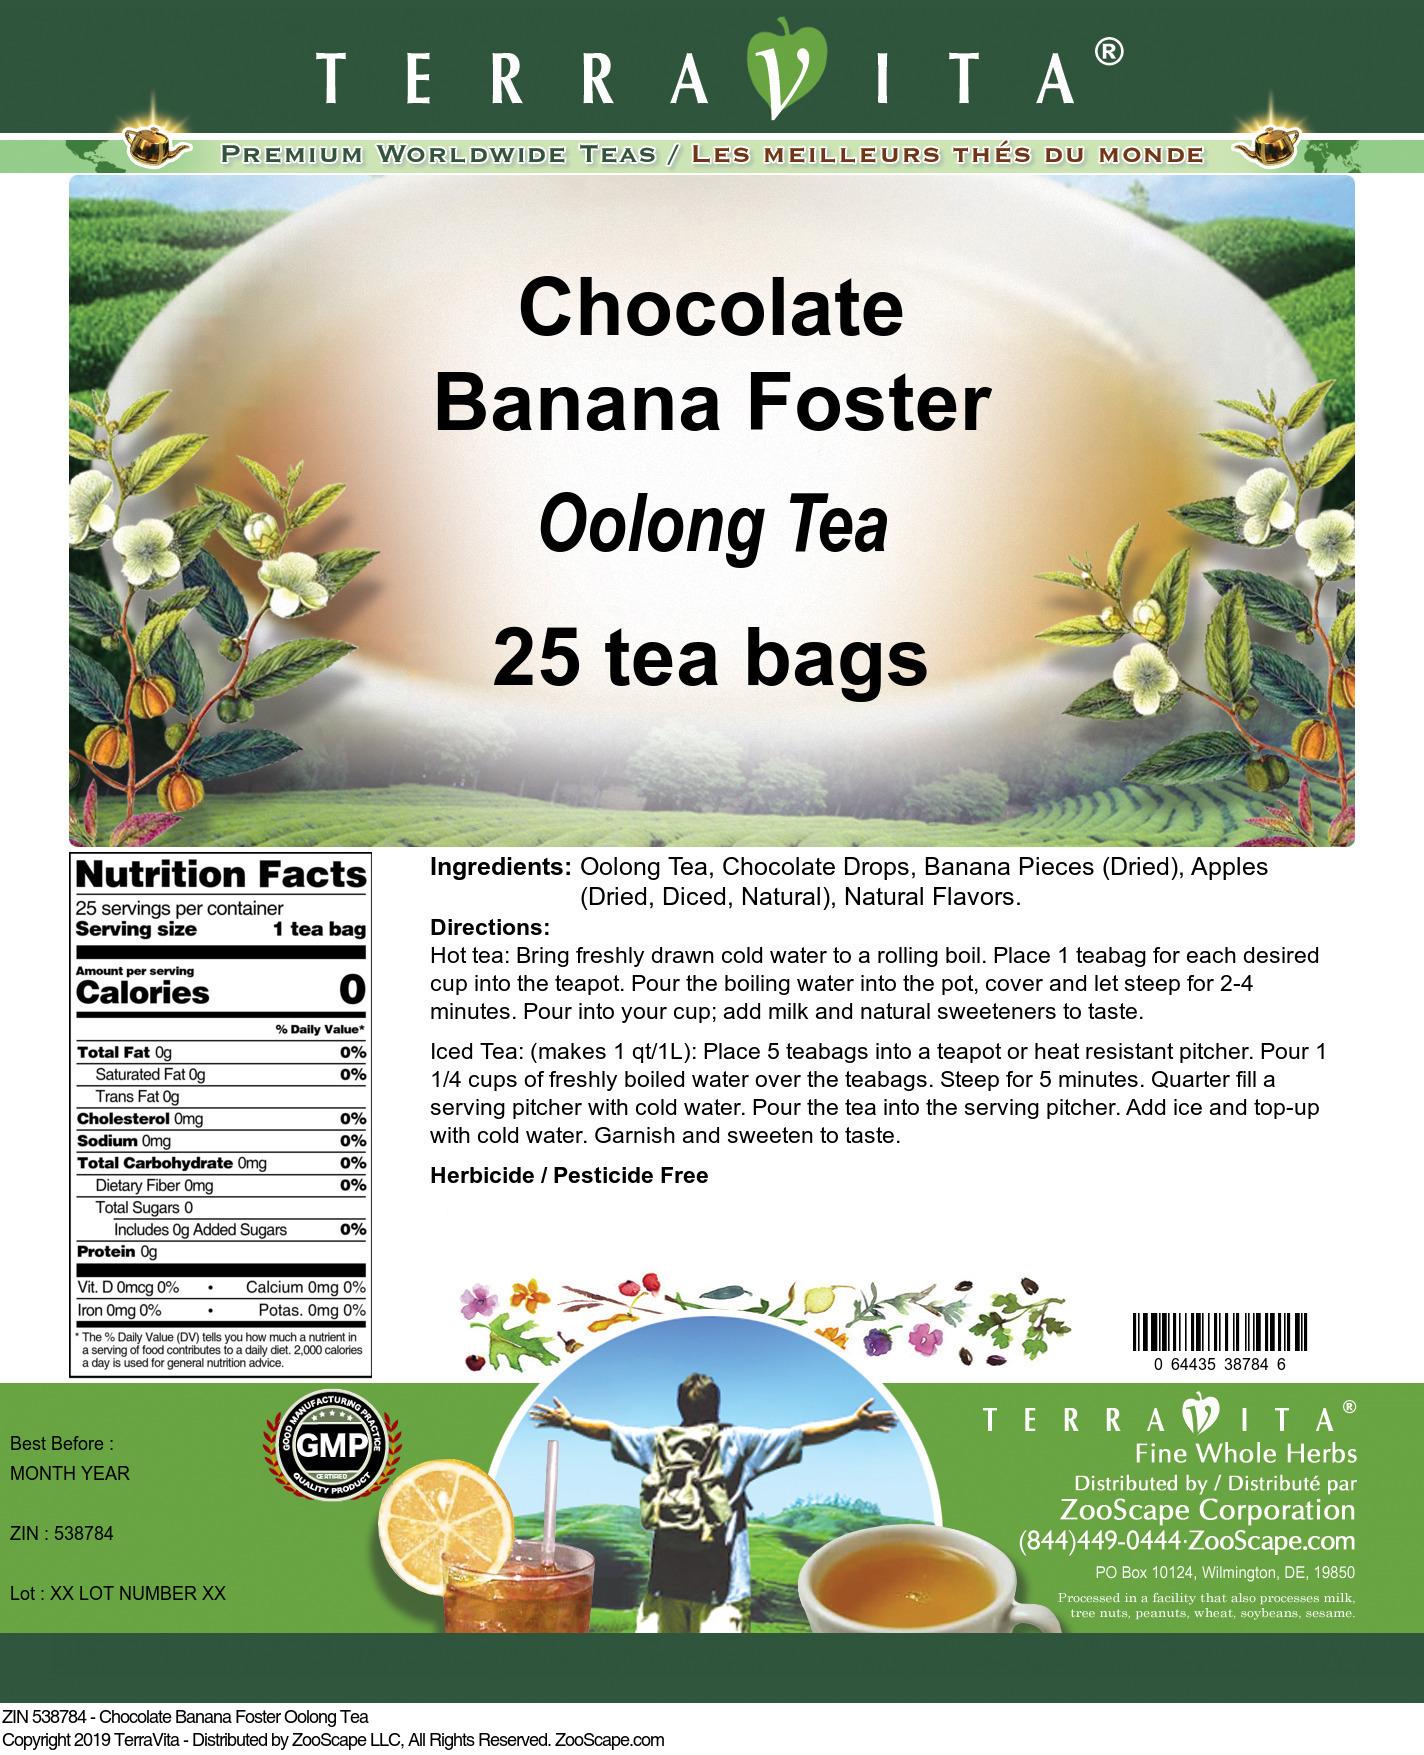 Chocolate Banana Foster Oolong Tea